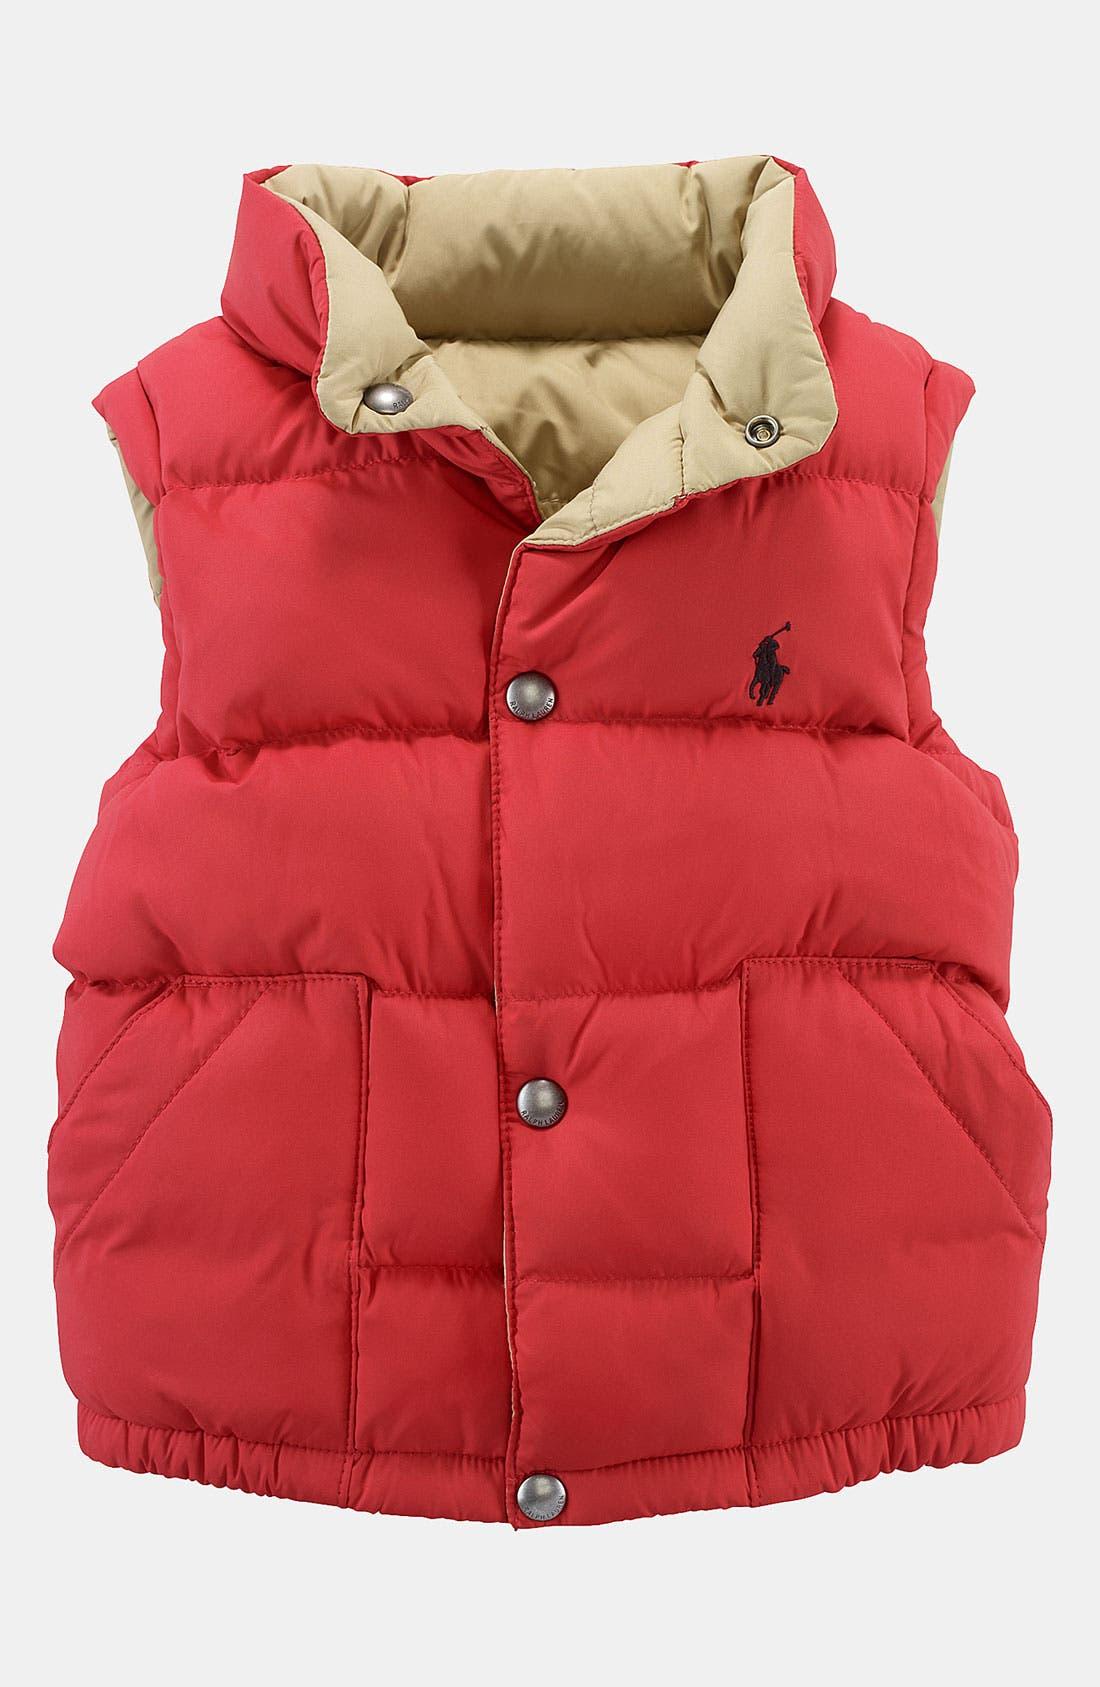 Main Image - Ralph Lauren Reversible Puffer Vest (Toddler)